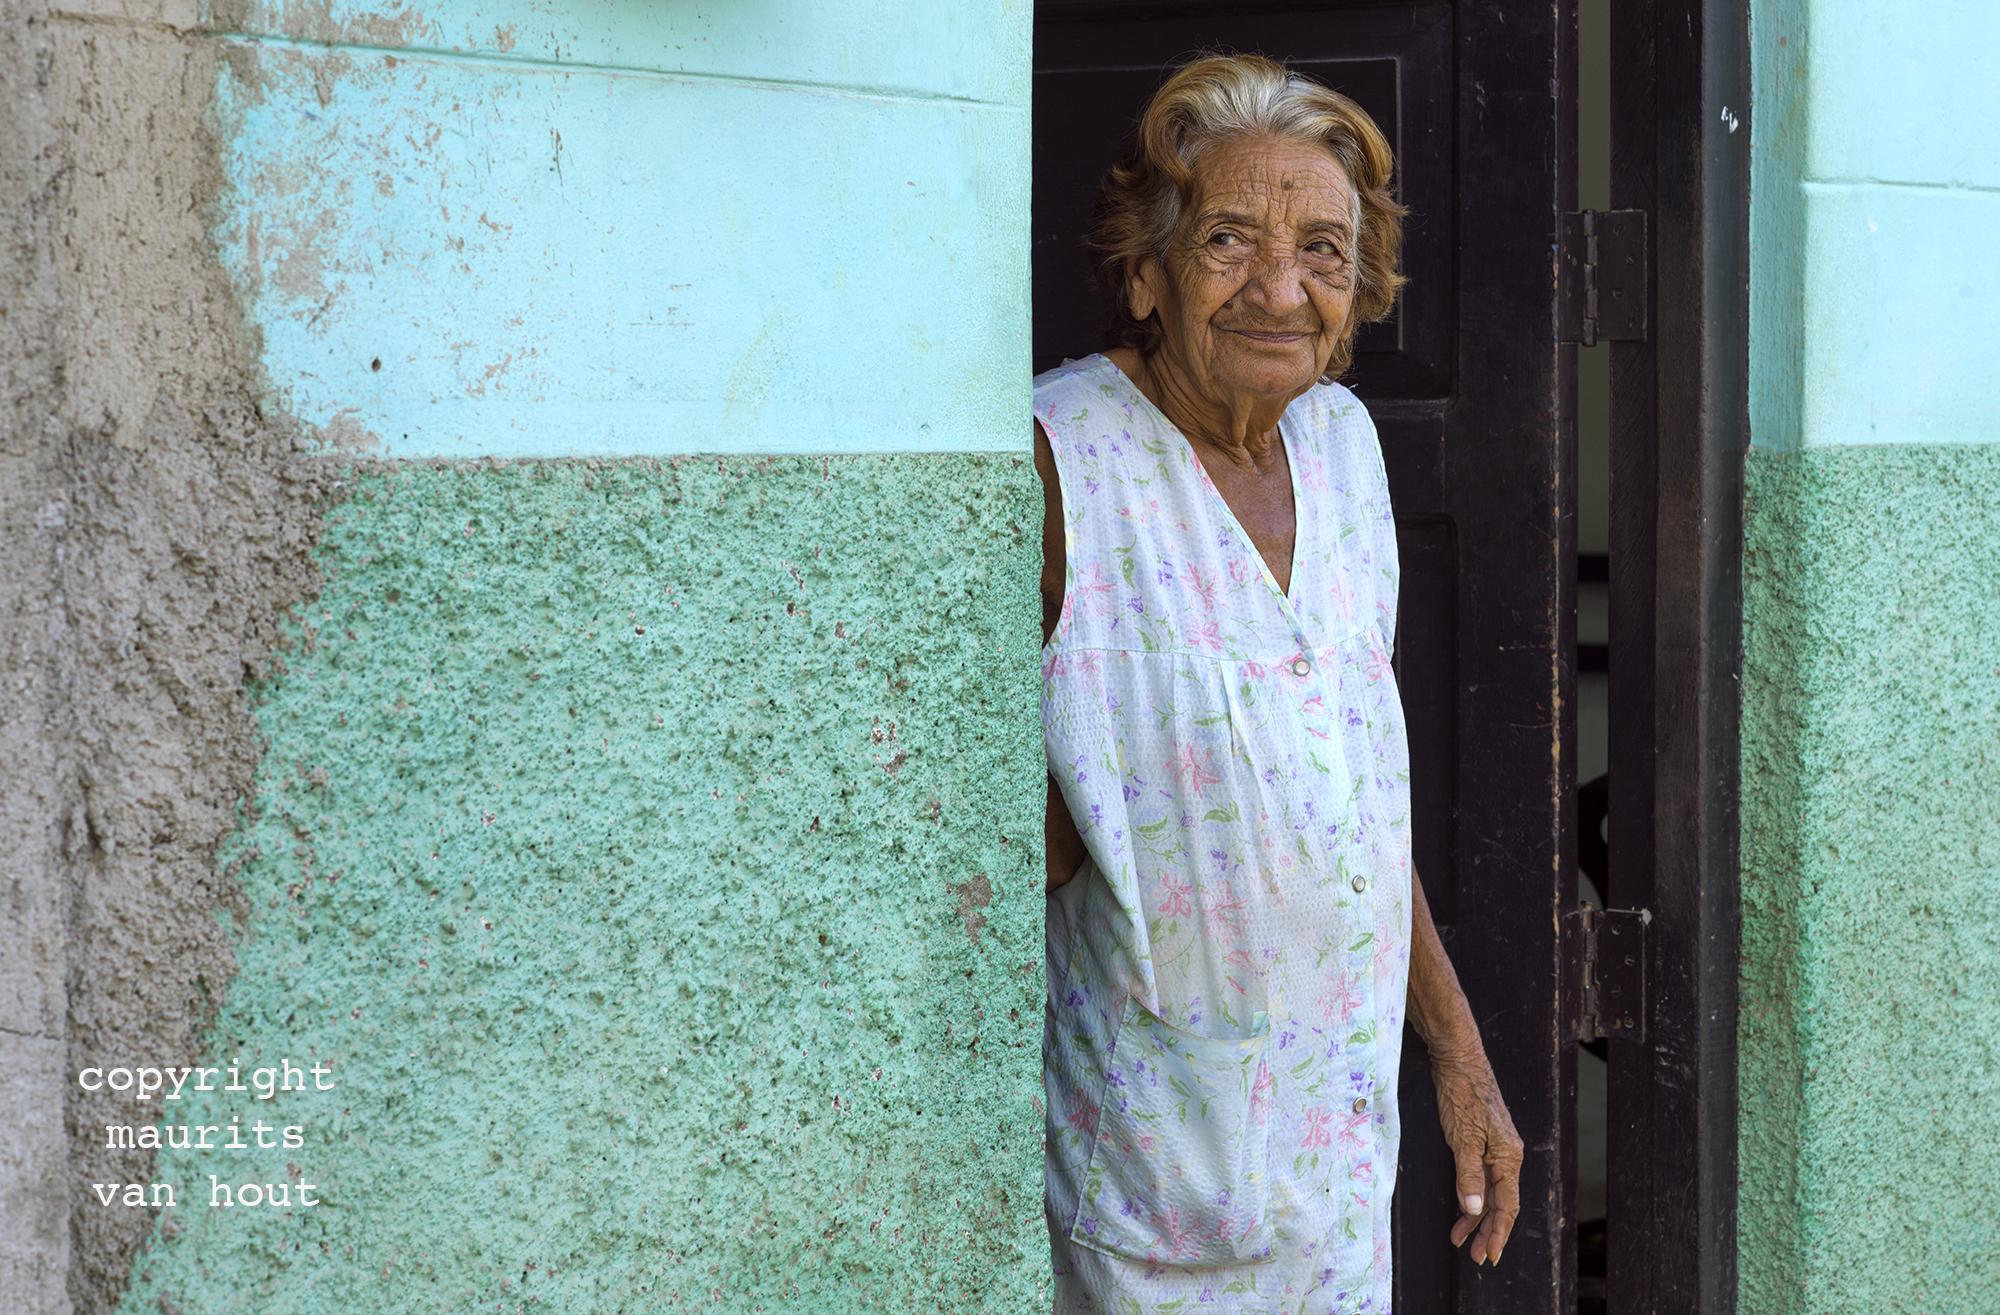 portrait of a woman, Trinidad Cuba, by Dutch photographer Maurits van Hout